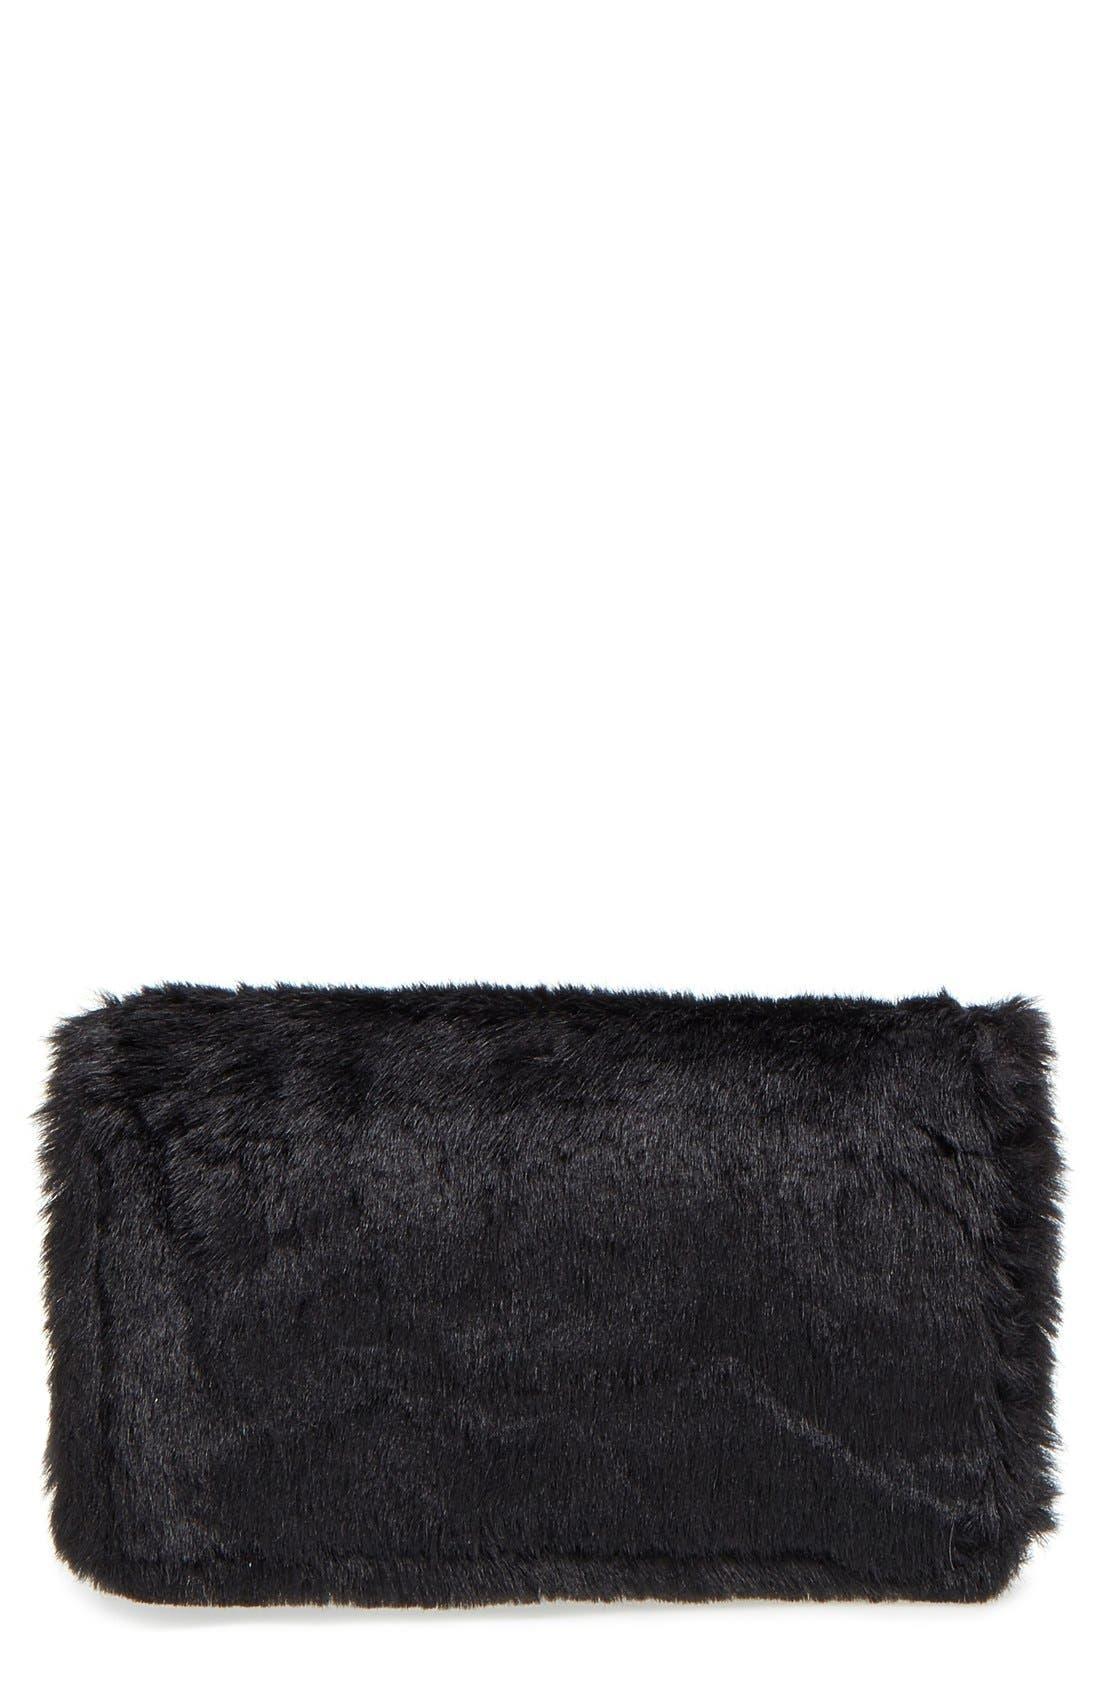 Faux Fur Flap Crossbody Clutch,                             Main thumbnail 1, color,                             Black